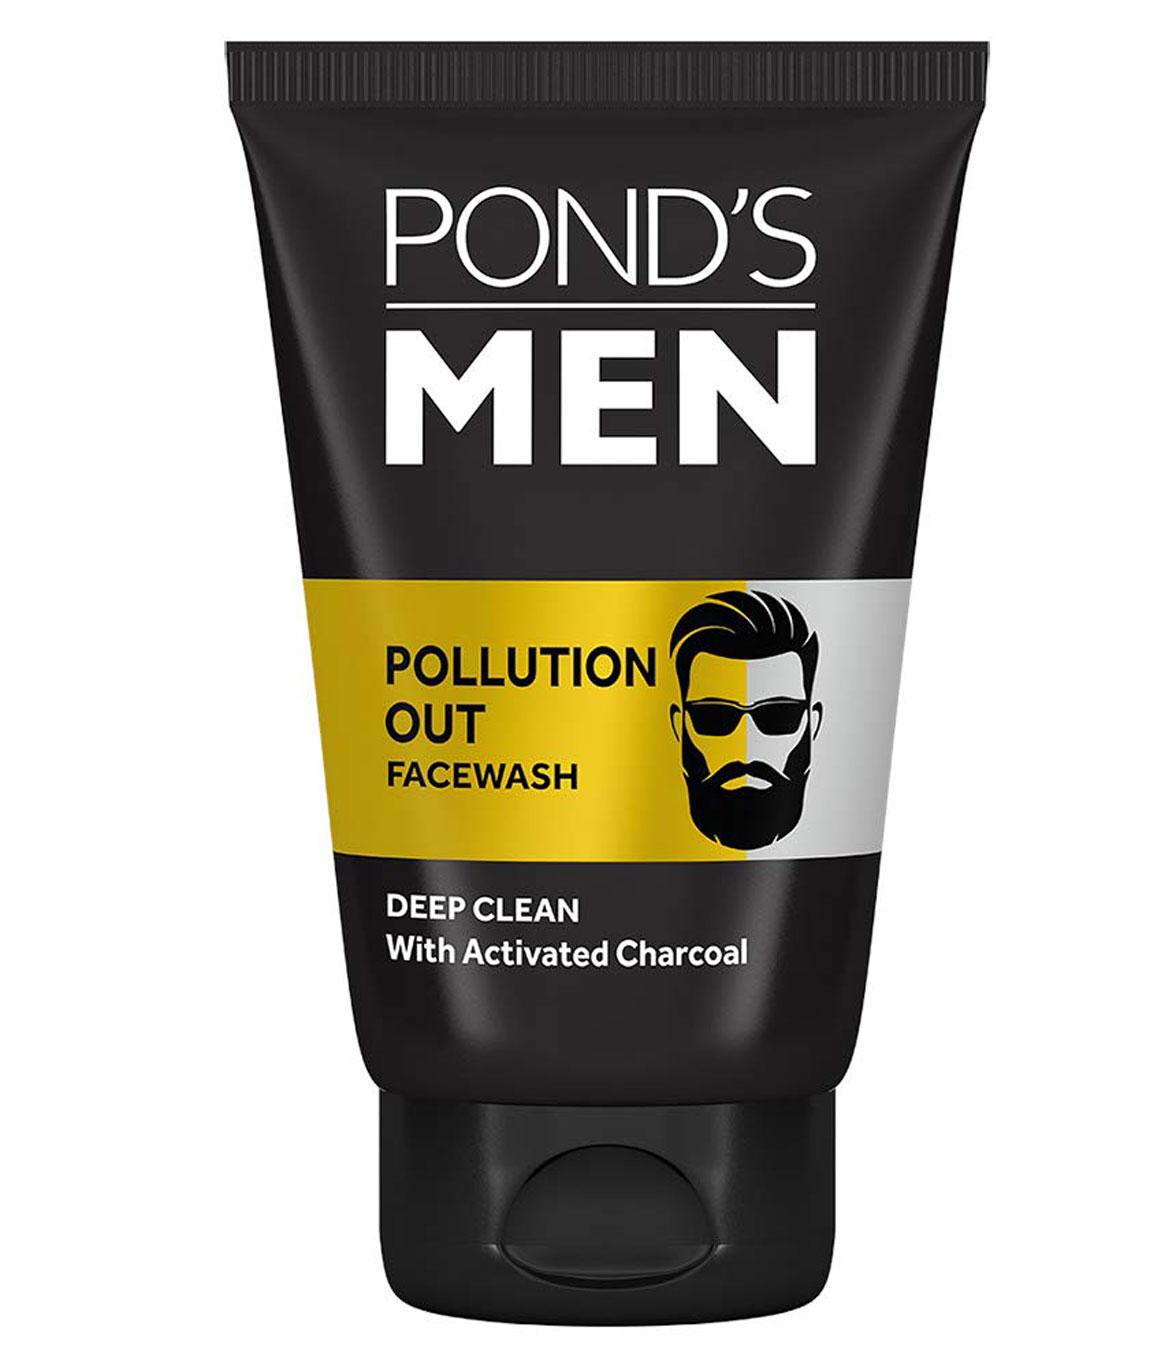 Ponds Men Pollution Out Activated Charcoal Deep Clean Facewash 50 g